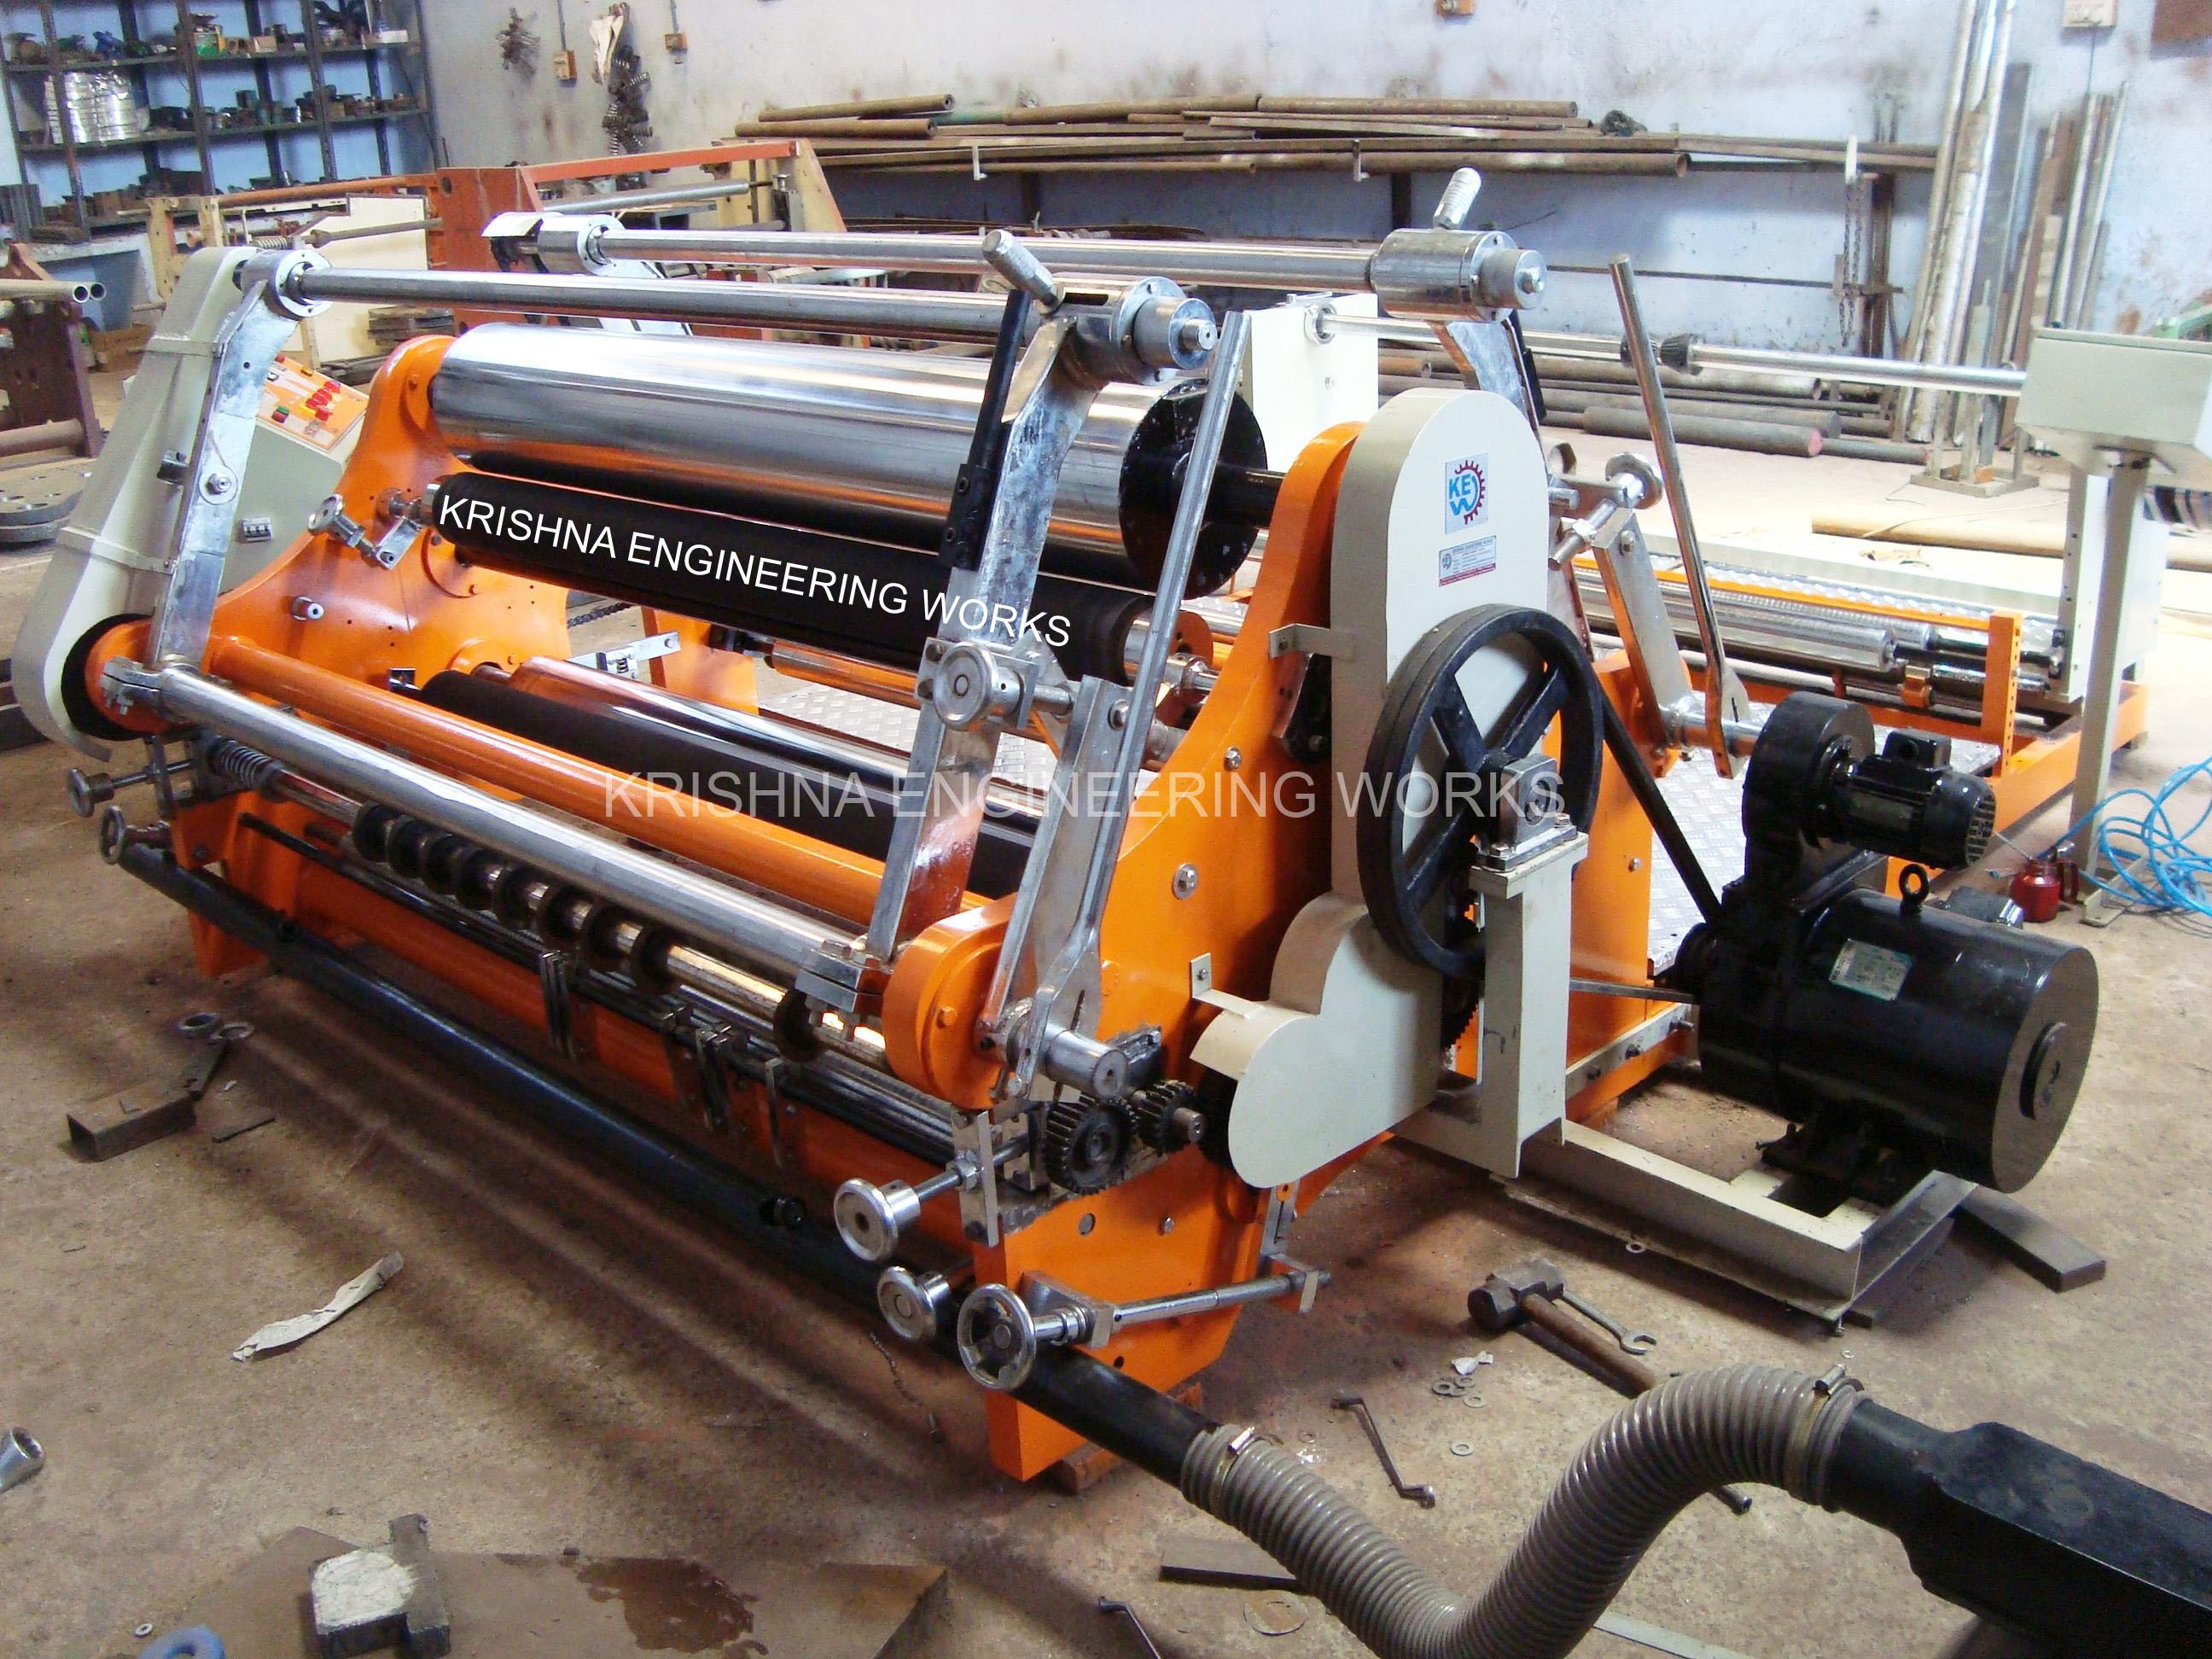 "<a href=""http://www.krishnaengineeringworks.fr/machine-de-rewinder-de-decoupeuse/"">Machine de Rewinder de Découpeuse</a>"